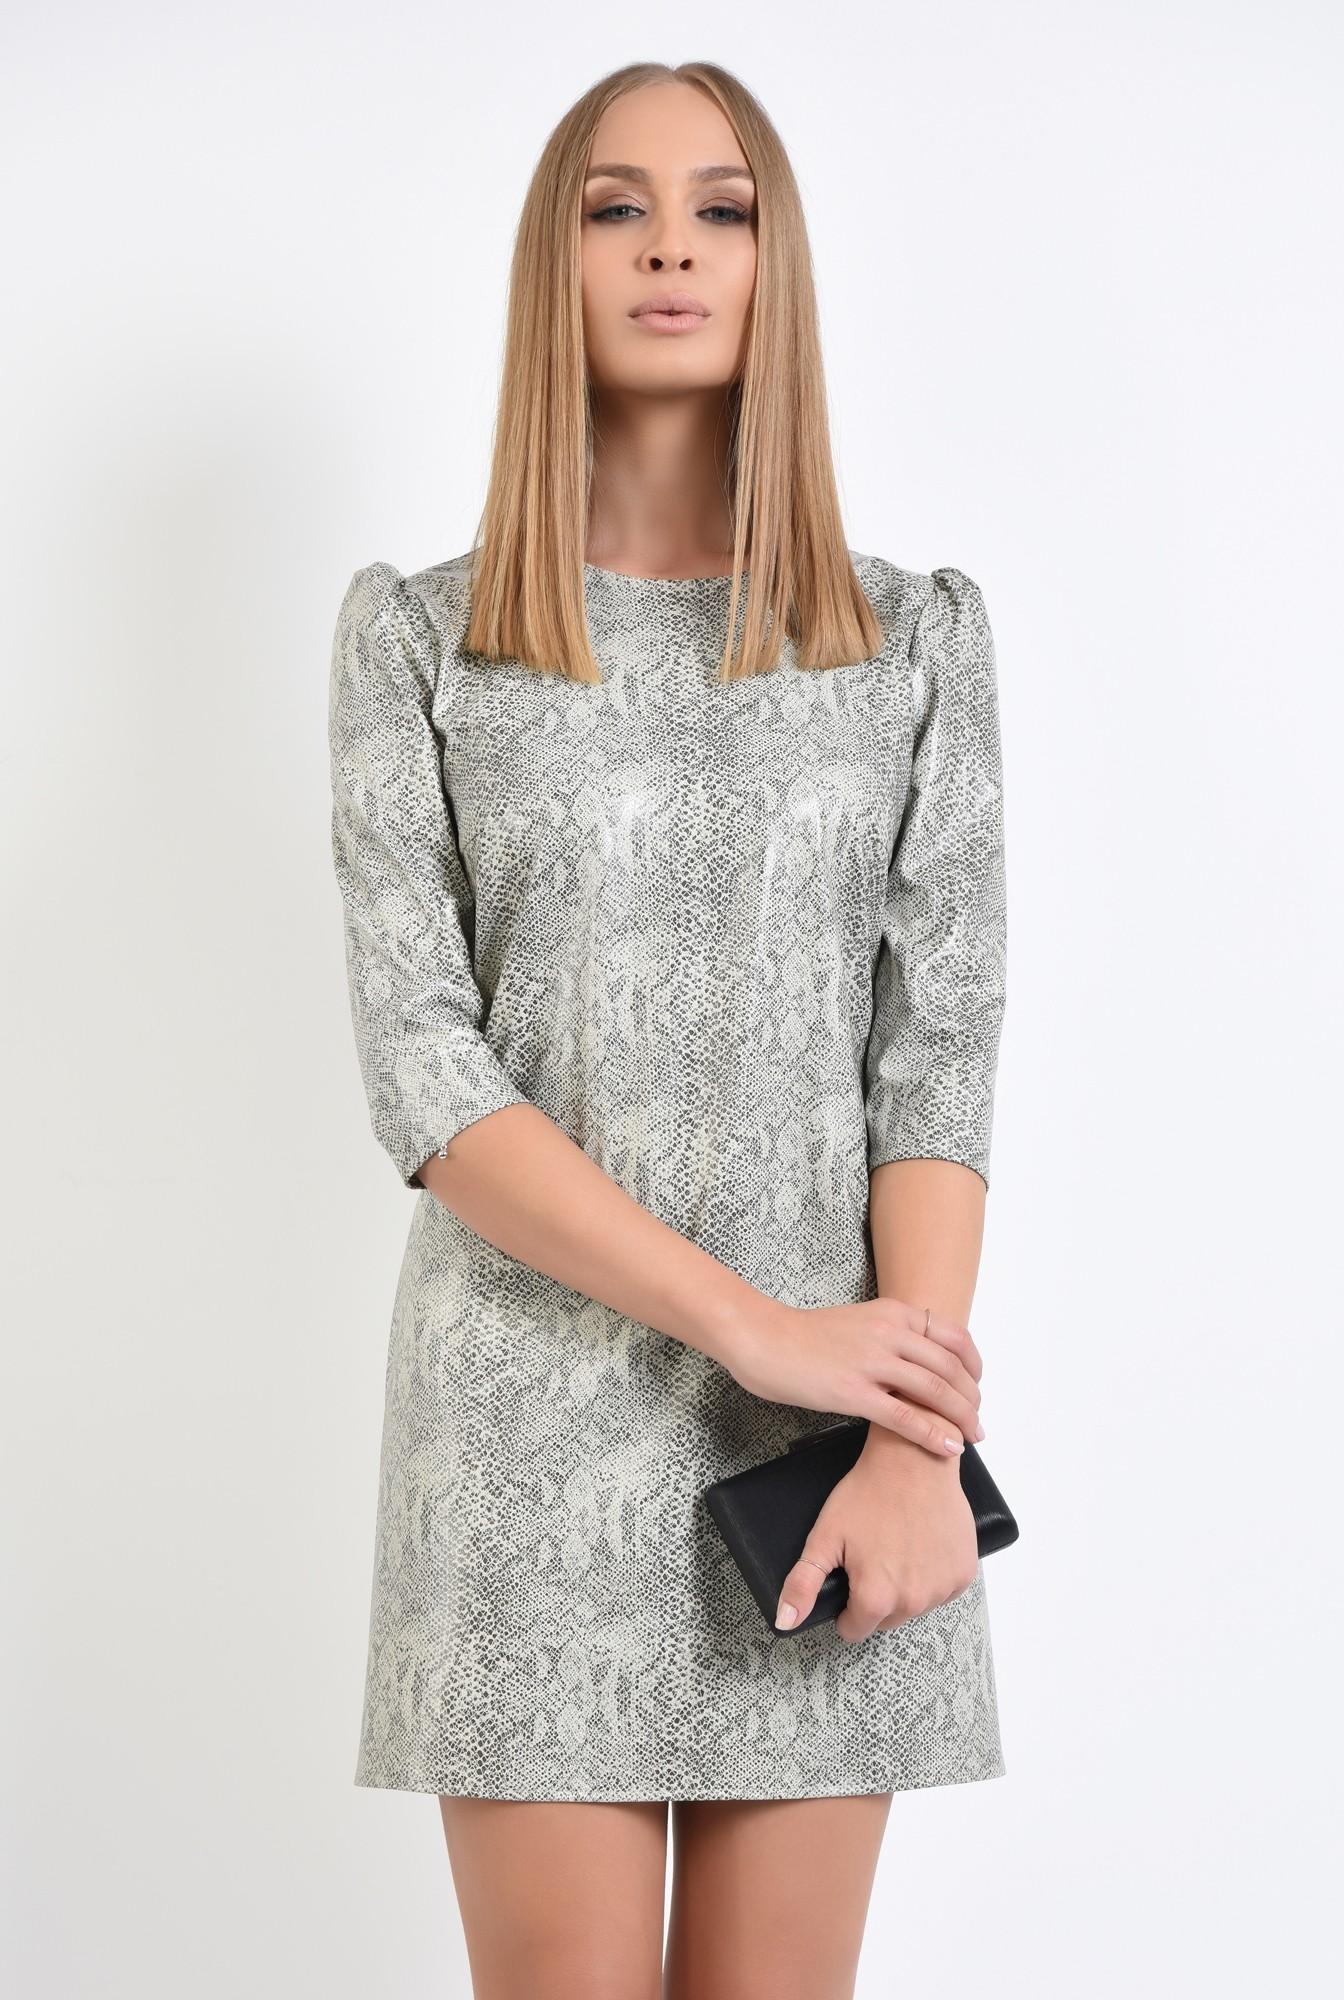 3 - rochie casual, piele eco, snakeskin, rochii online